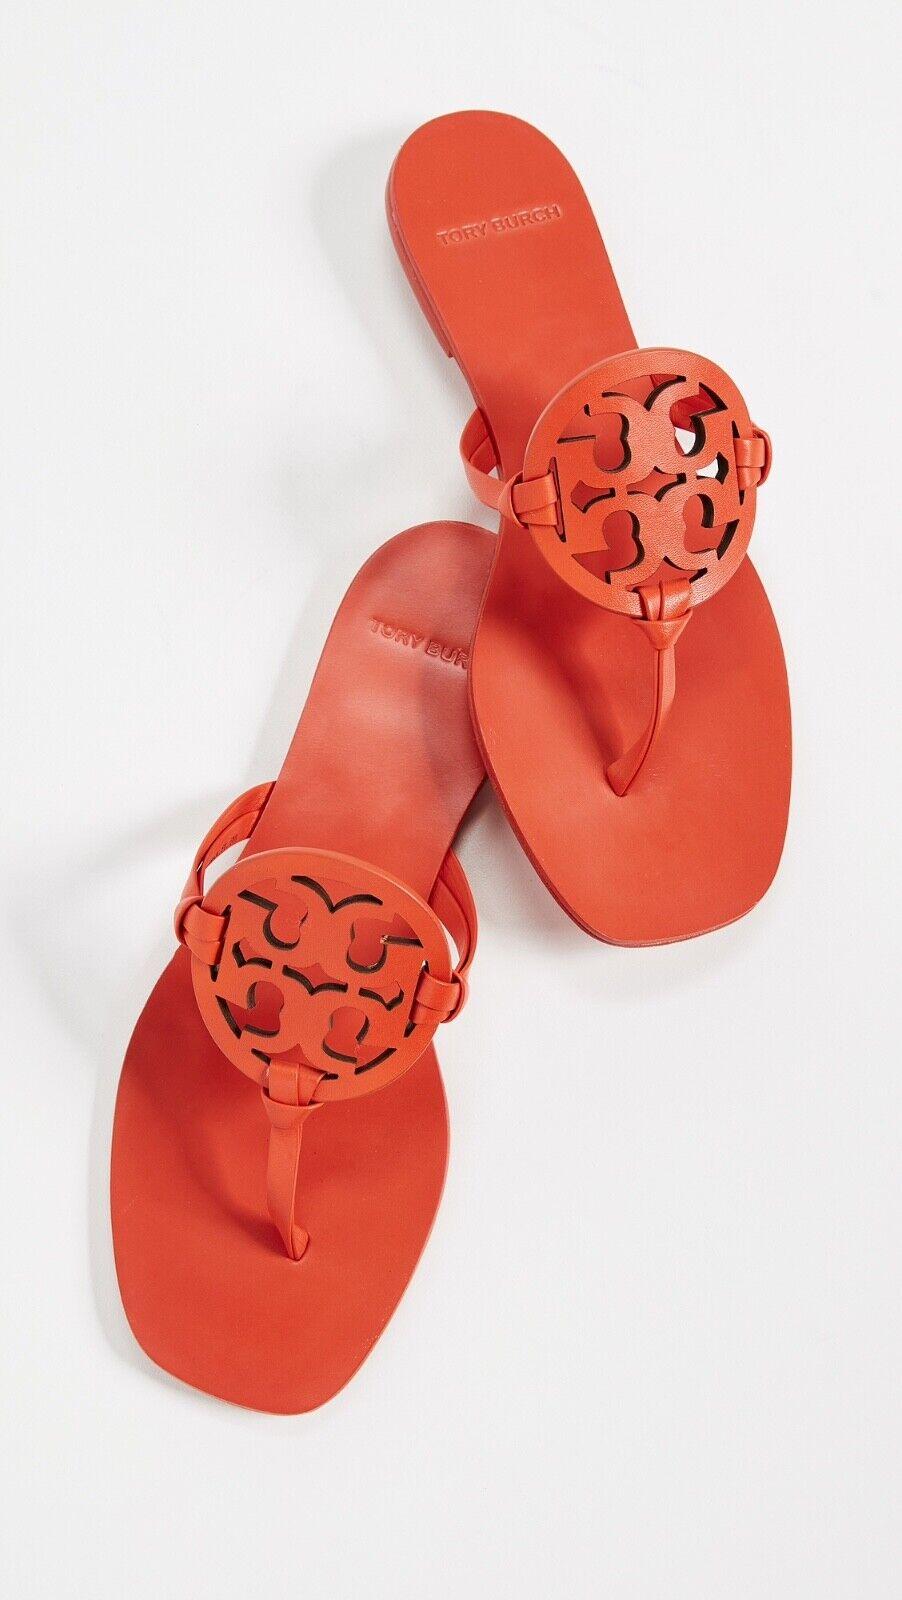 Nuevo En Caja  228 Tory Burch Puntera Cuadrada Miller Dulce Naranja Mandarina Flip Flop Talla 6.5